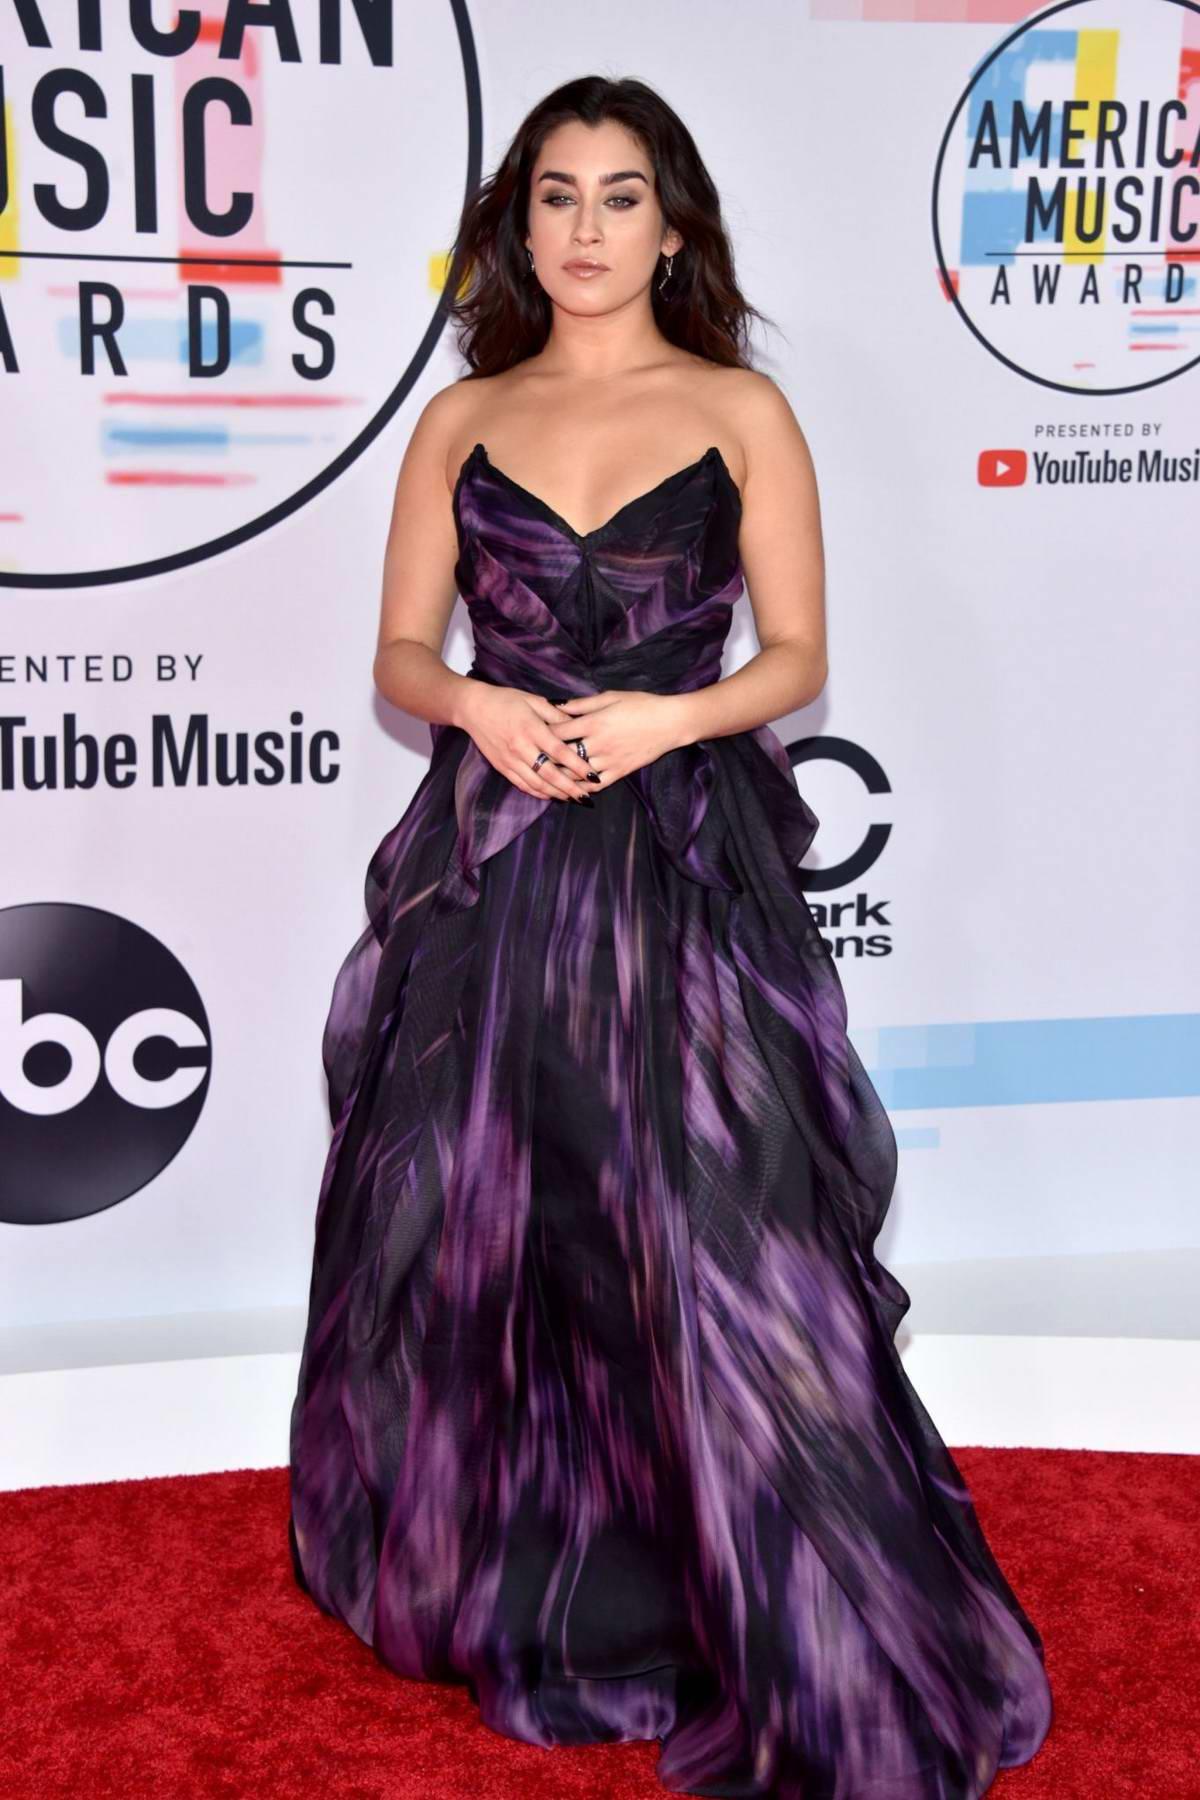 Lauren Jauregui attends 2018 American Music Awards (AMA 2018) at Microsoft Theater in Los Angeles